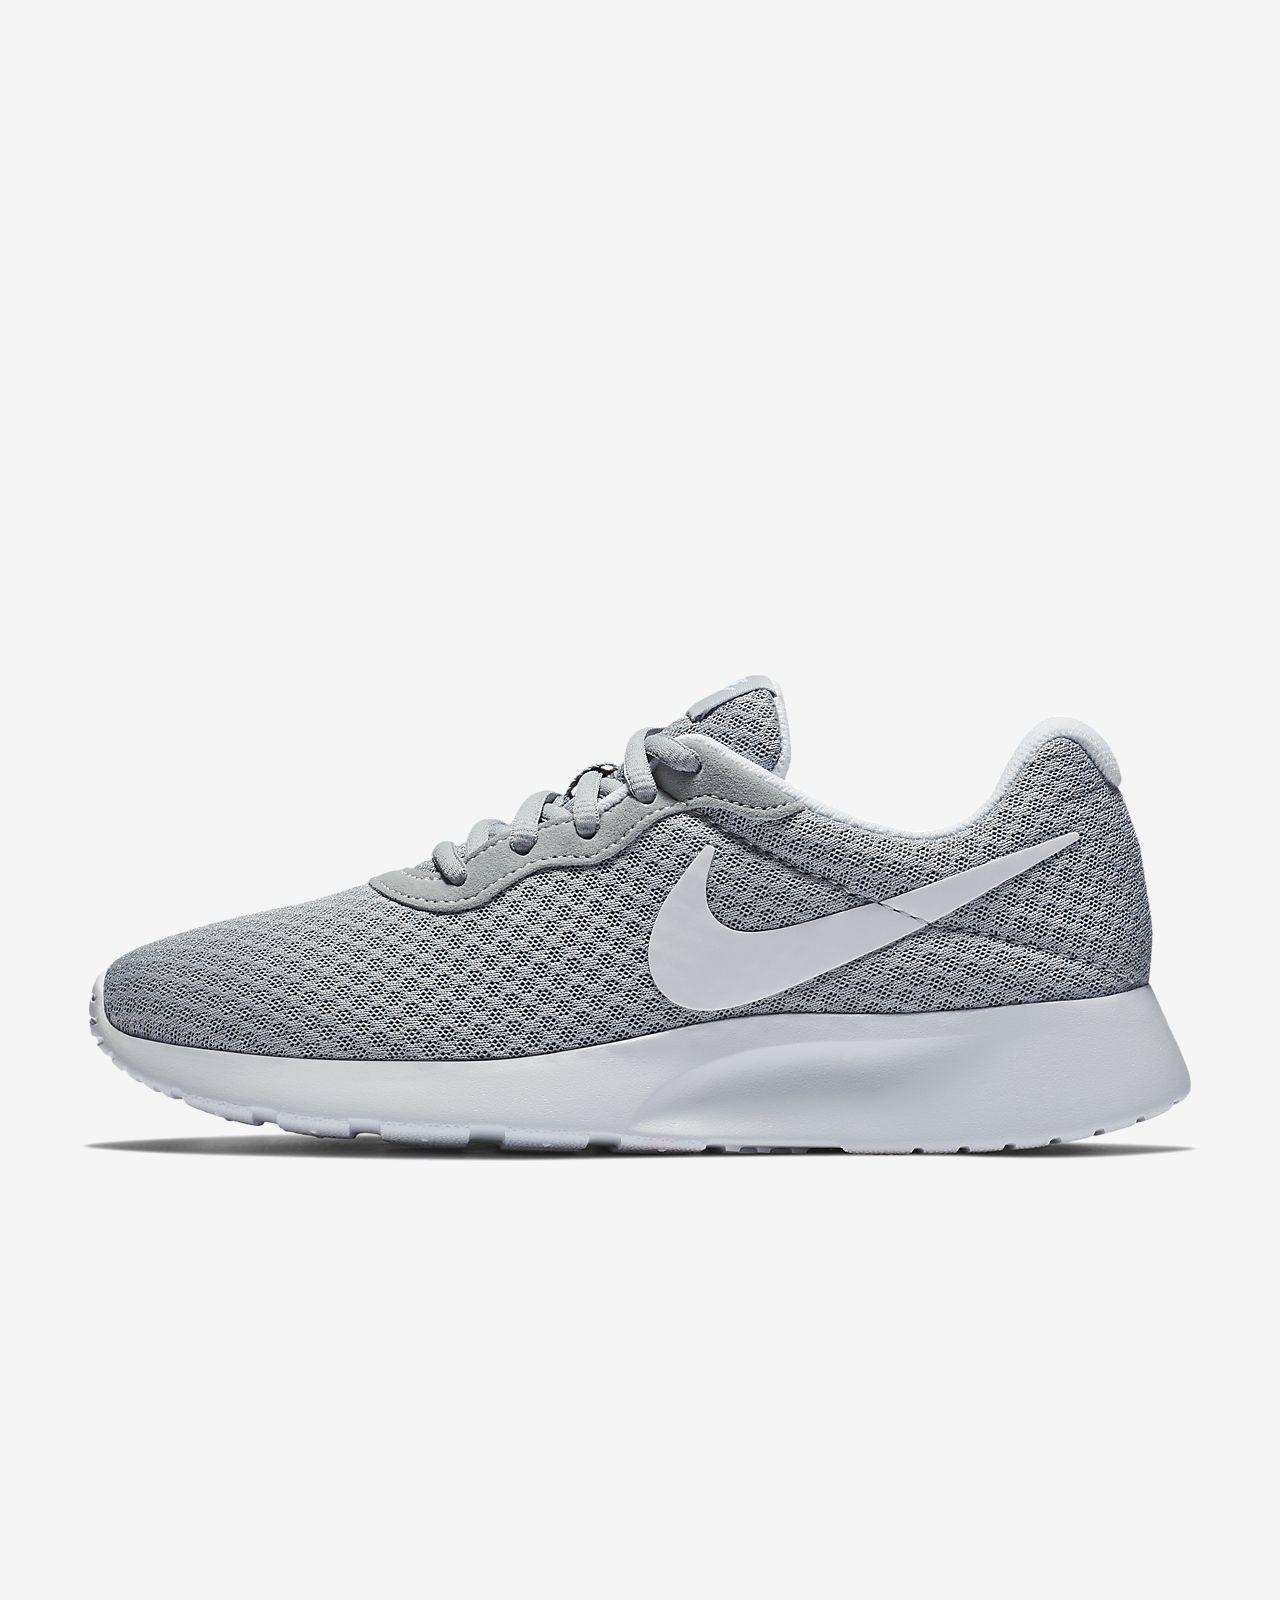 large discount lowest discount speical offer Nike Tanjun Women's Shoe